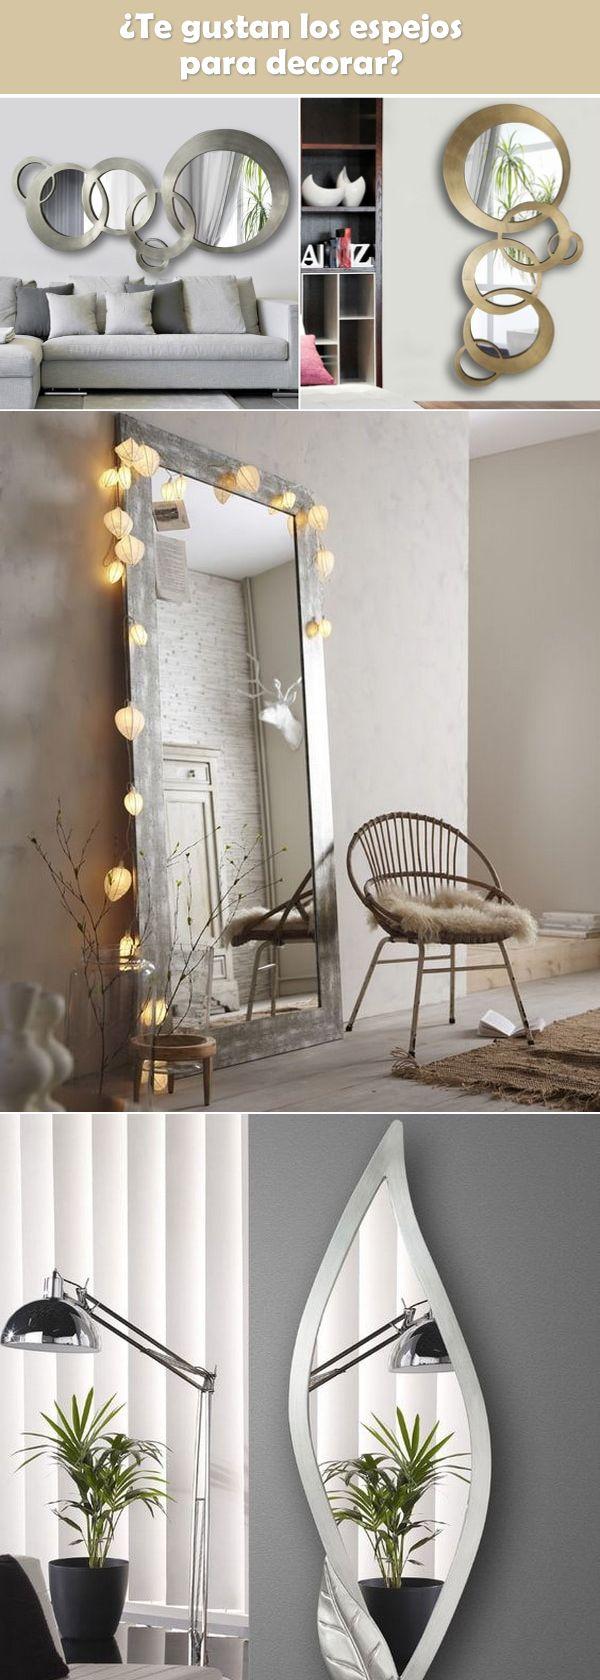 Mejores 288 im genes de trucos decoraci n en pinterest - Trucos hogar decoracion ...